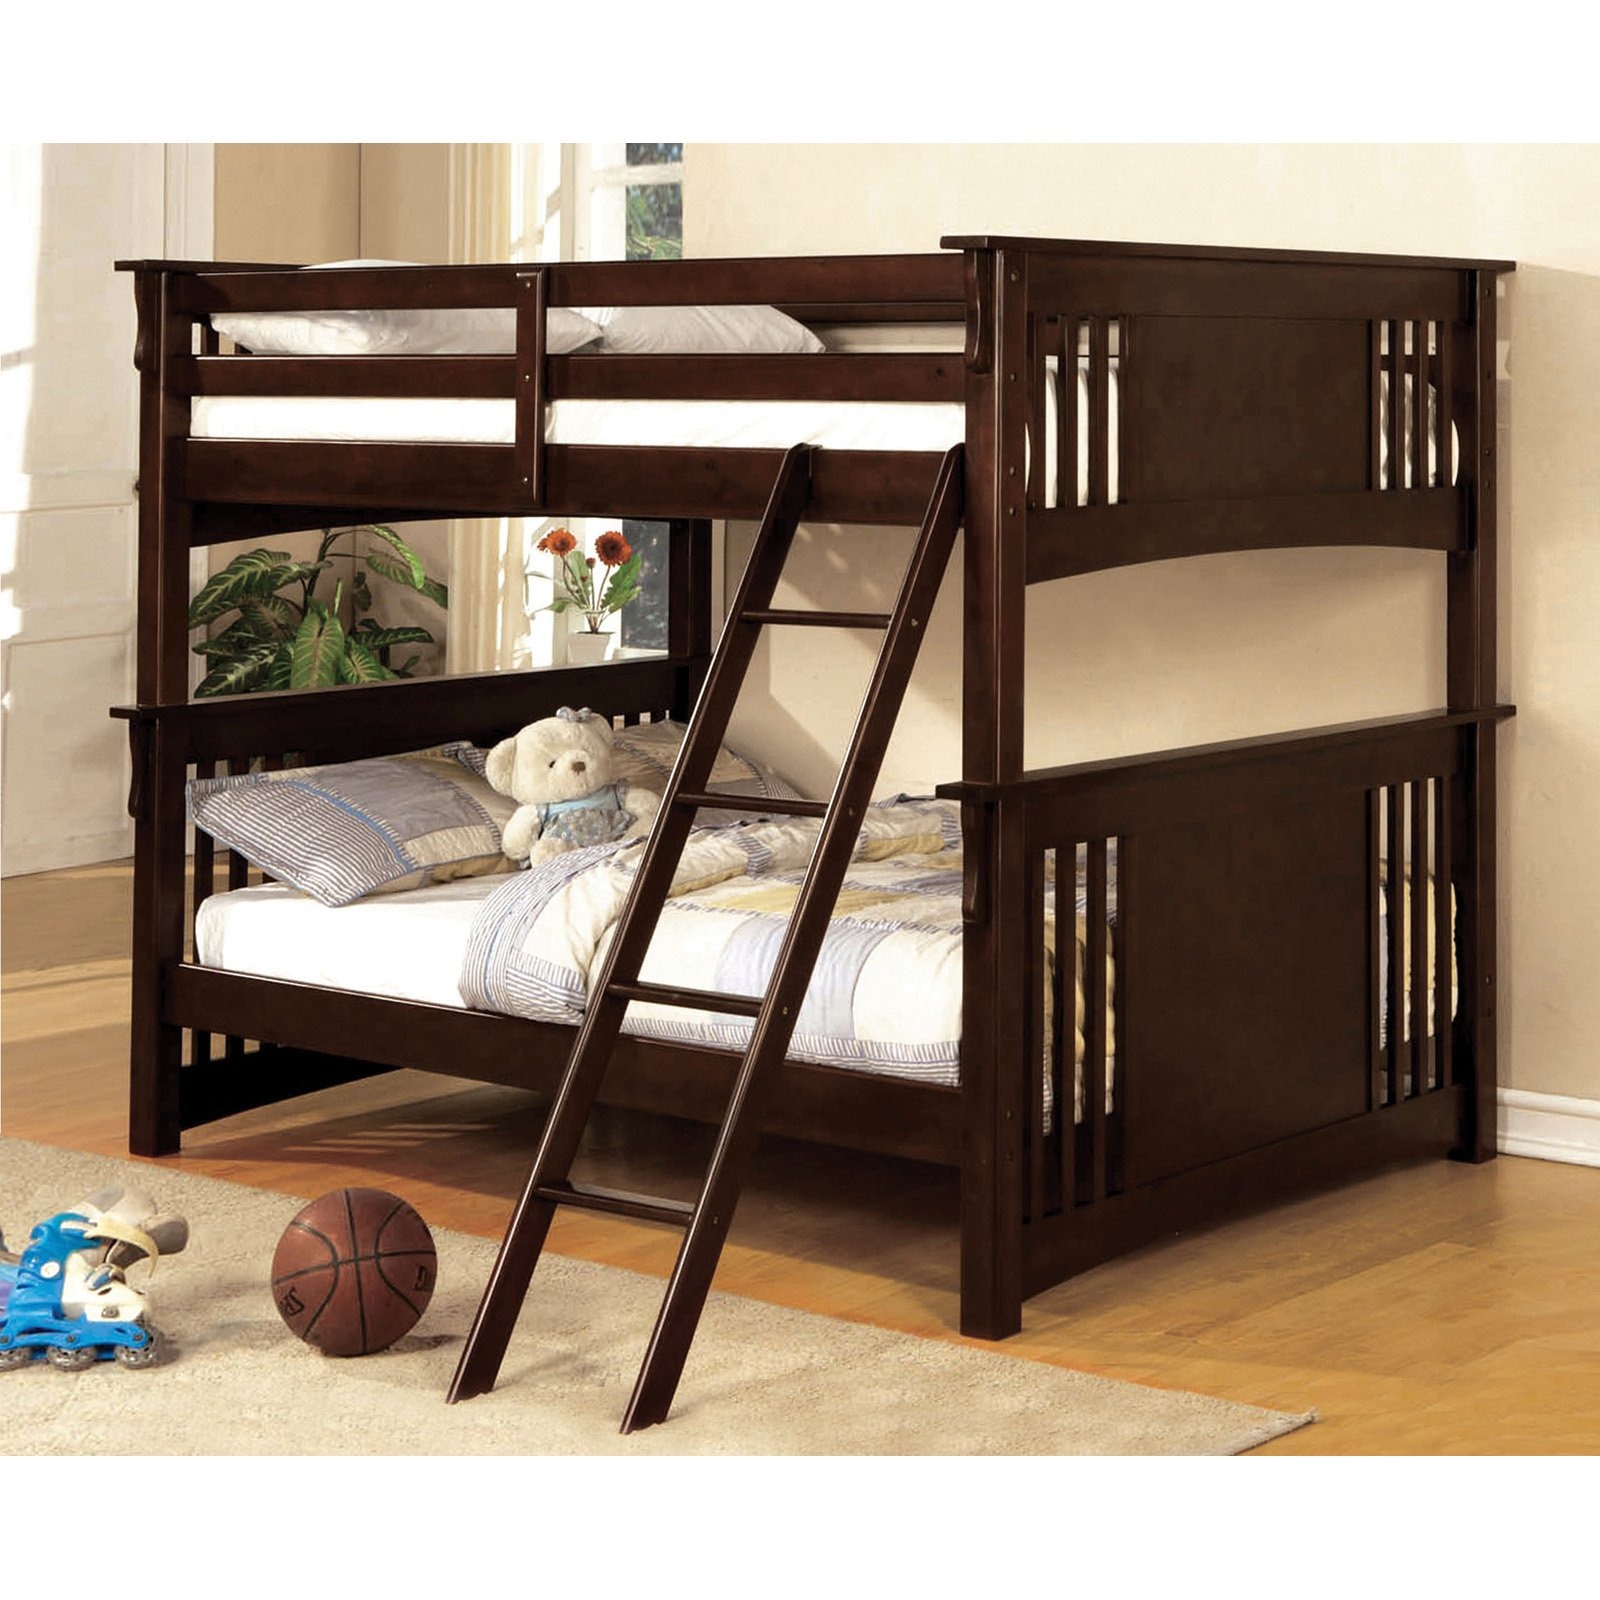 Furniture Of America Paramount Full Over Full Bunk Bed   Dark Walnut    Walmart.com